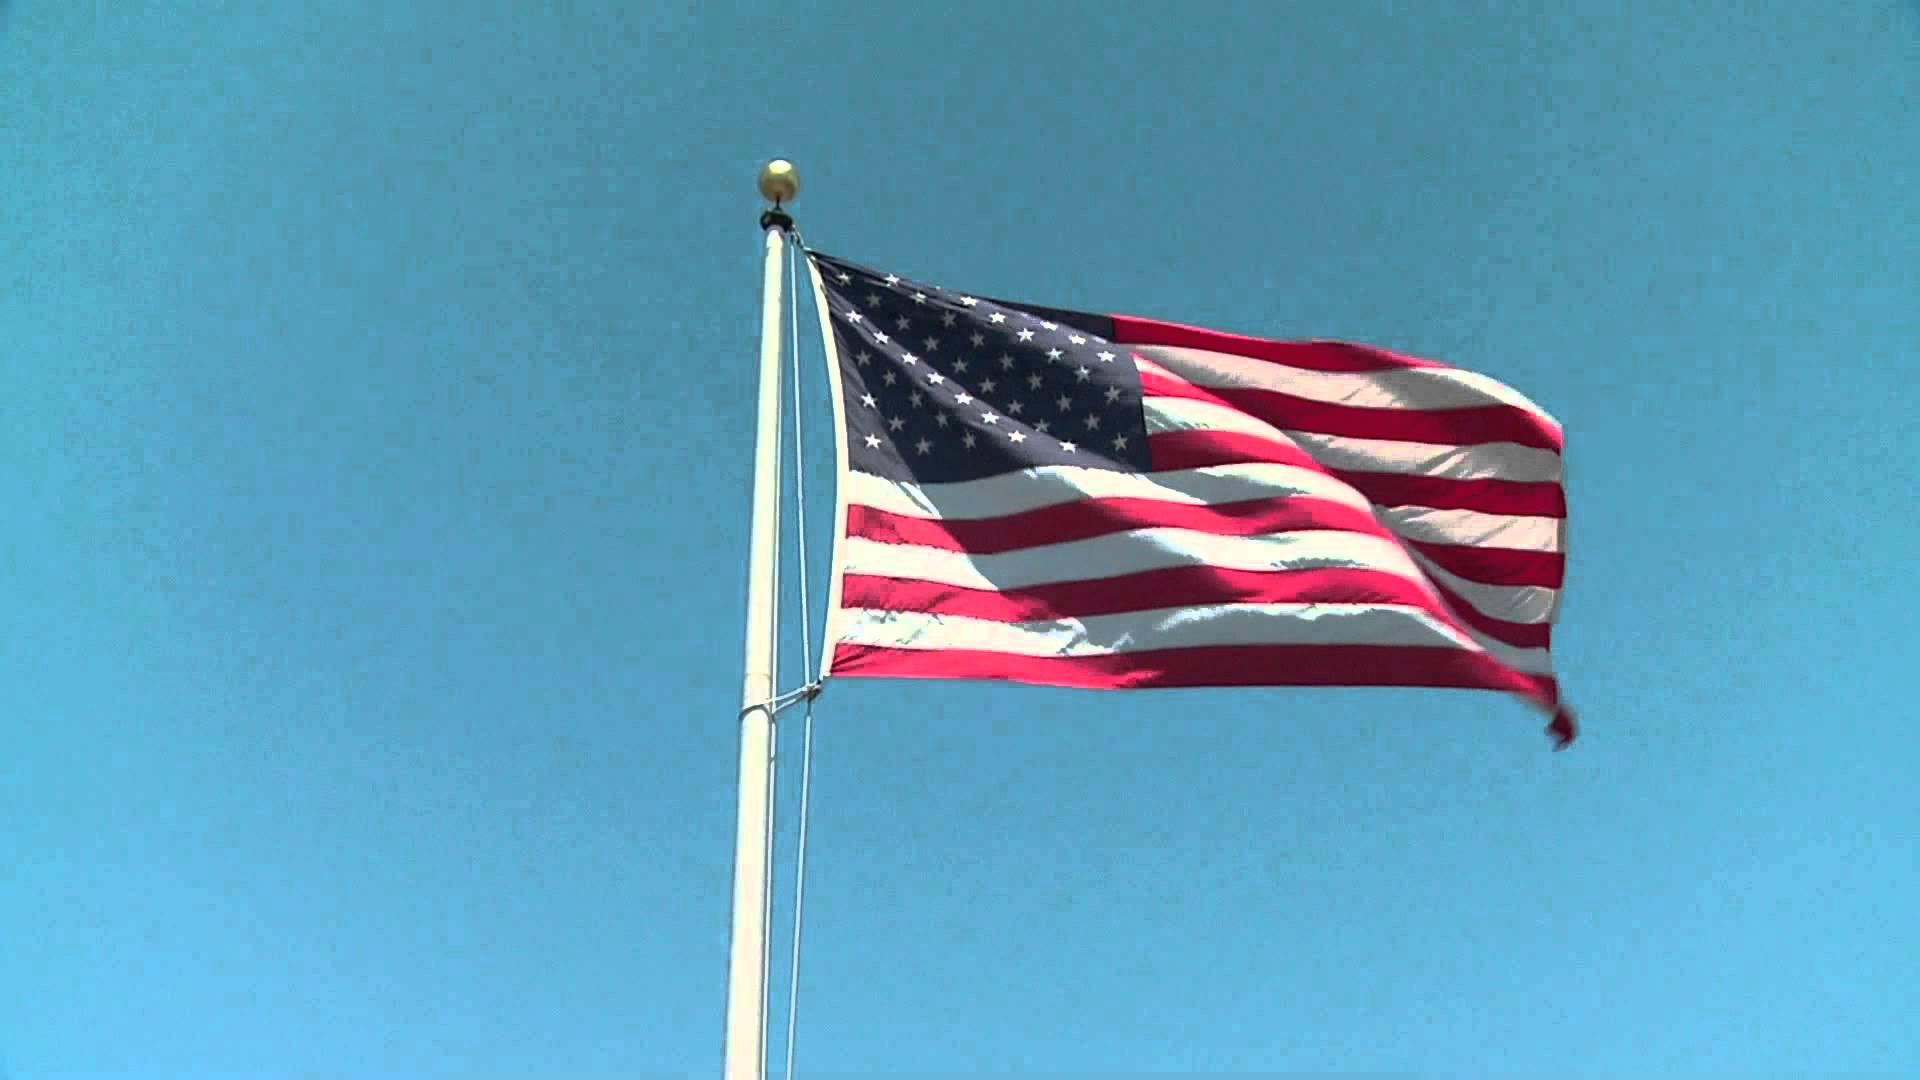 بالصور صور علم امريكا , اجمل صور لعلم امريكا 980 3